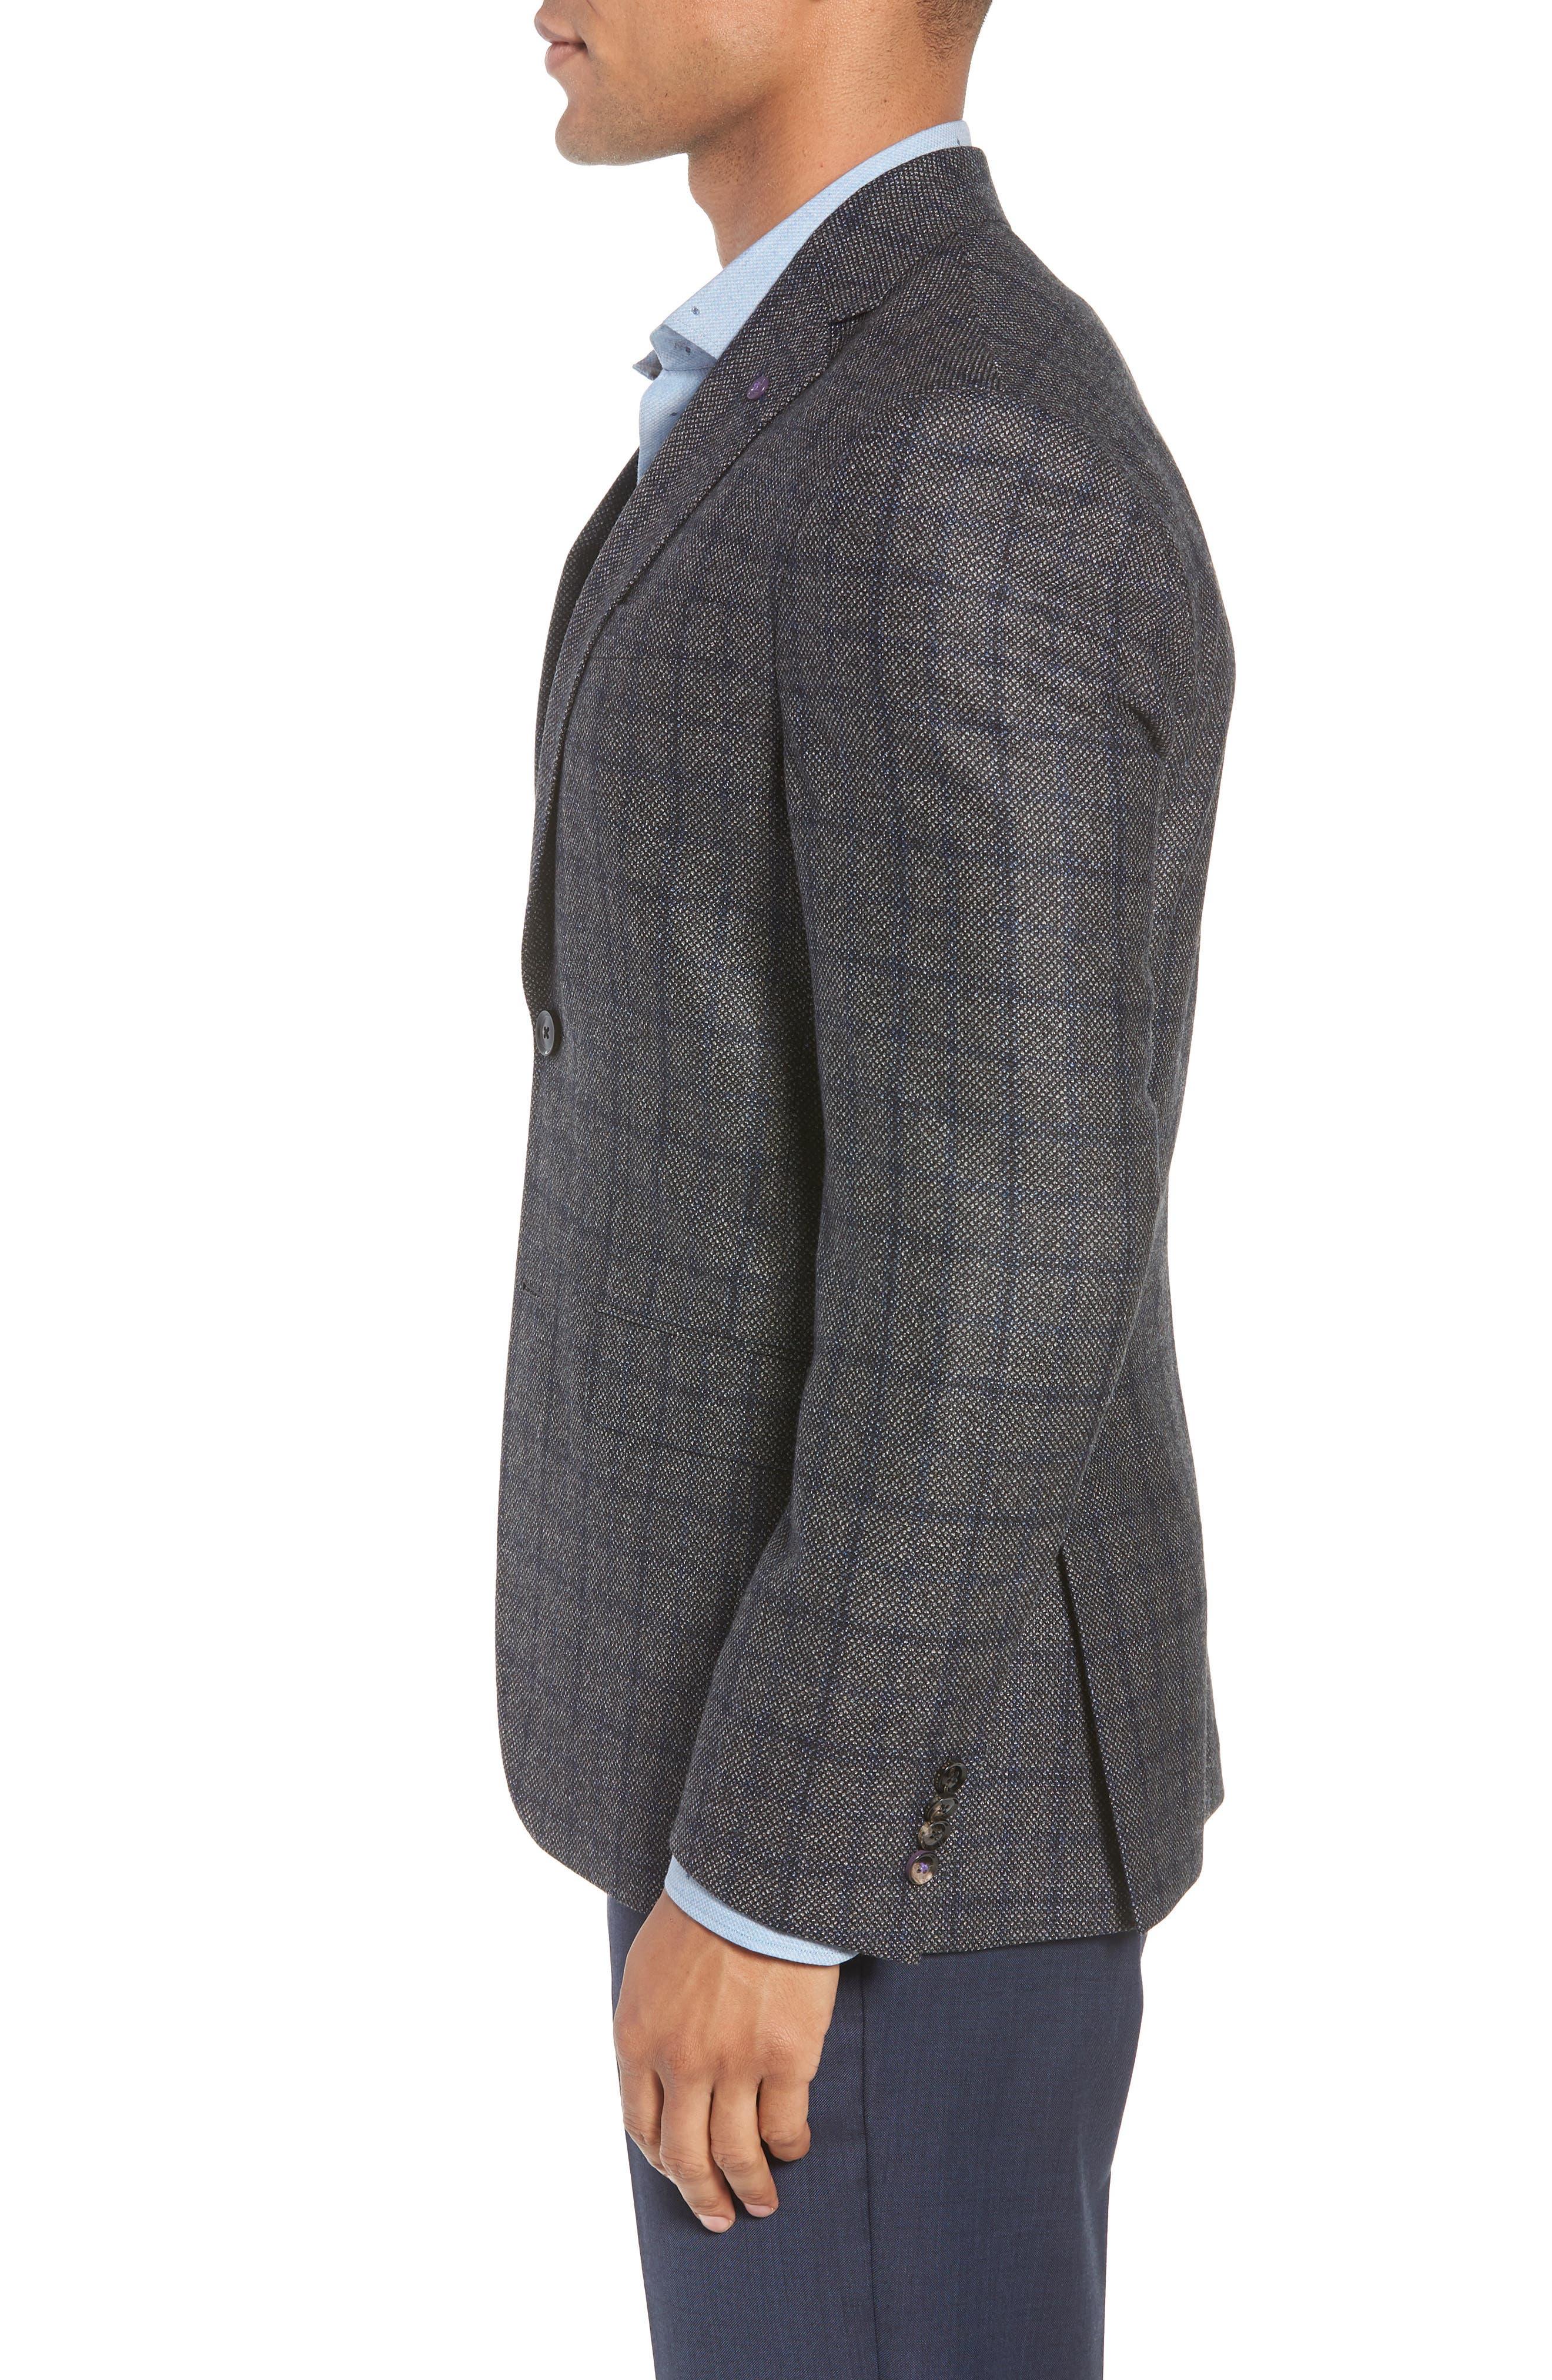 Konan Trim Fit Windowpane Wool Sport Coat,                             Alternate thumbnail 3, color,                             GREY